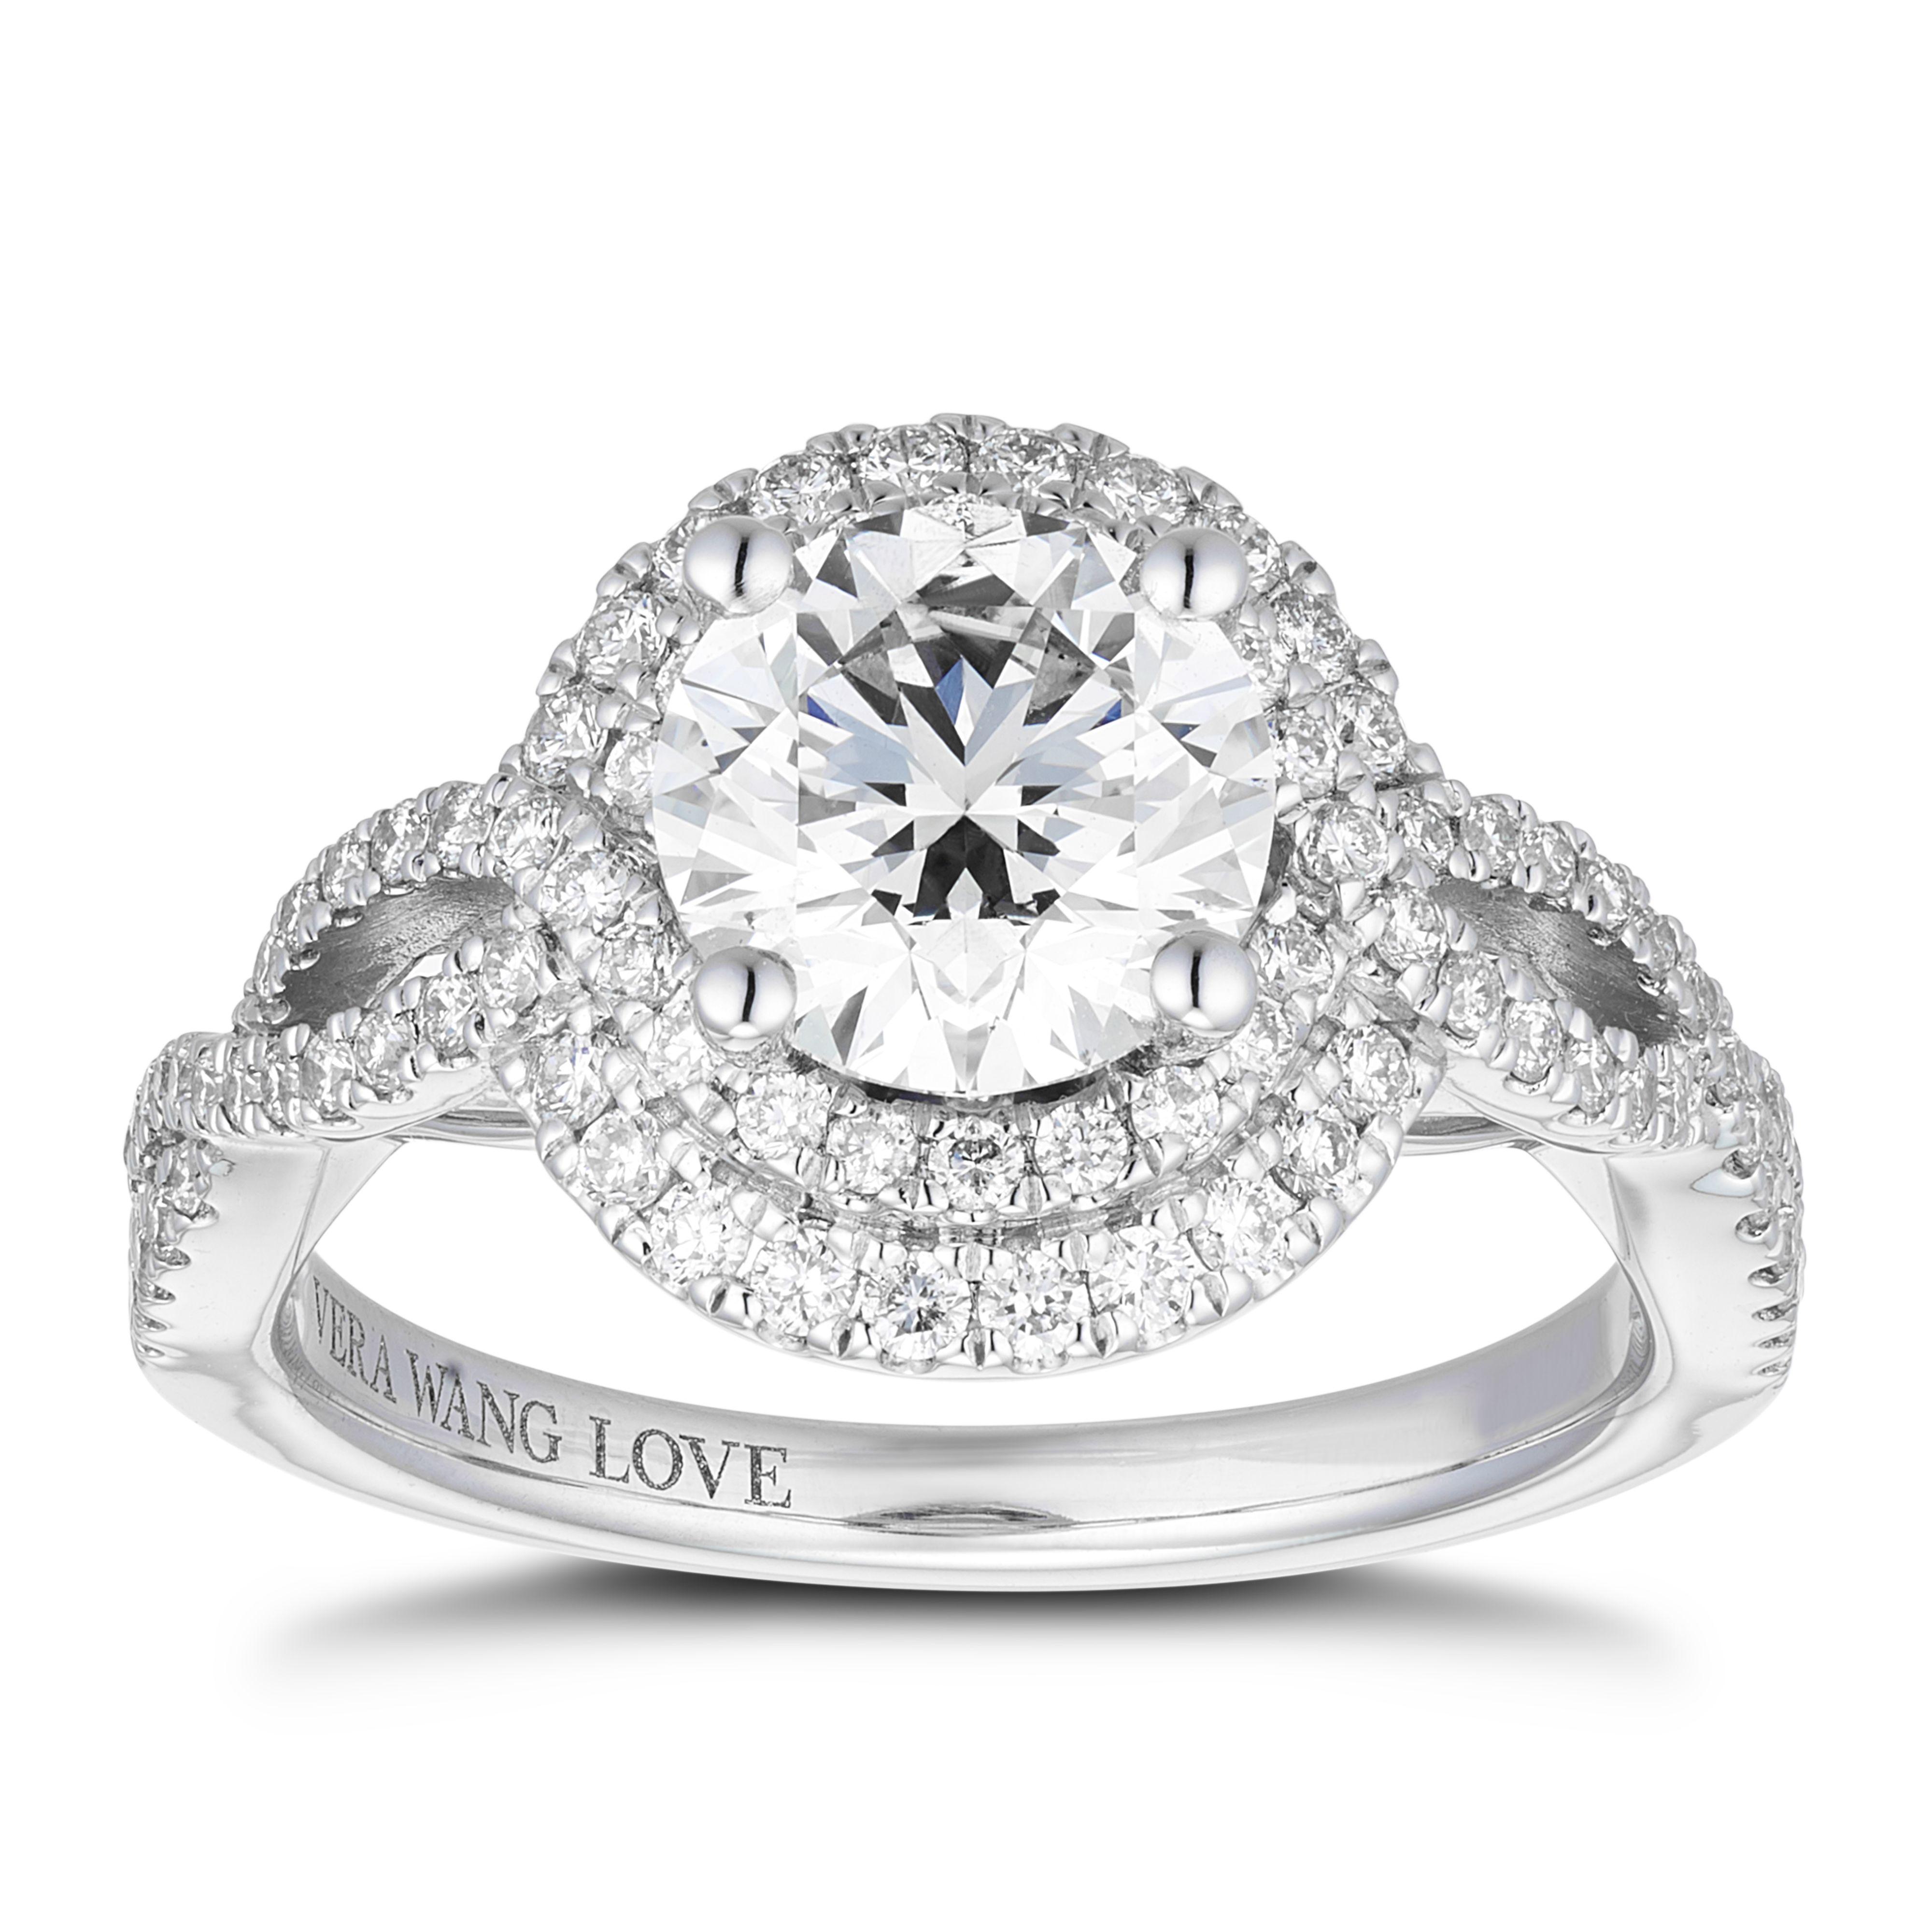 Vera Wang 18ct White Gold 1.95ct Diamond Double Halo Ring